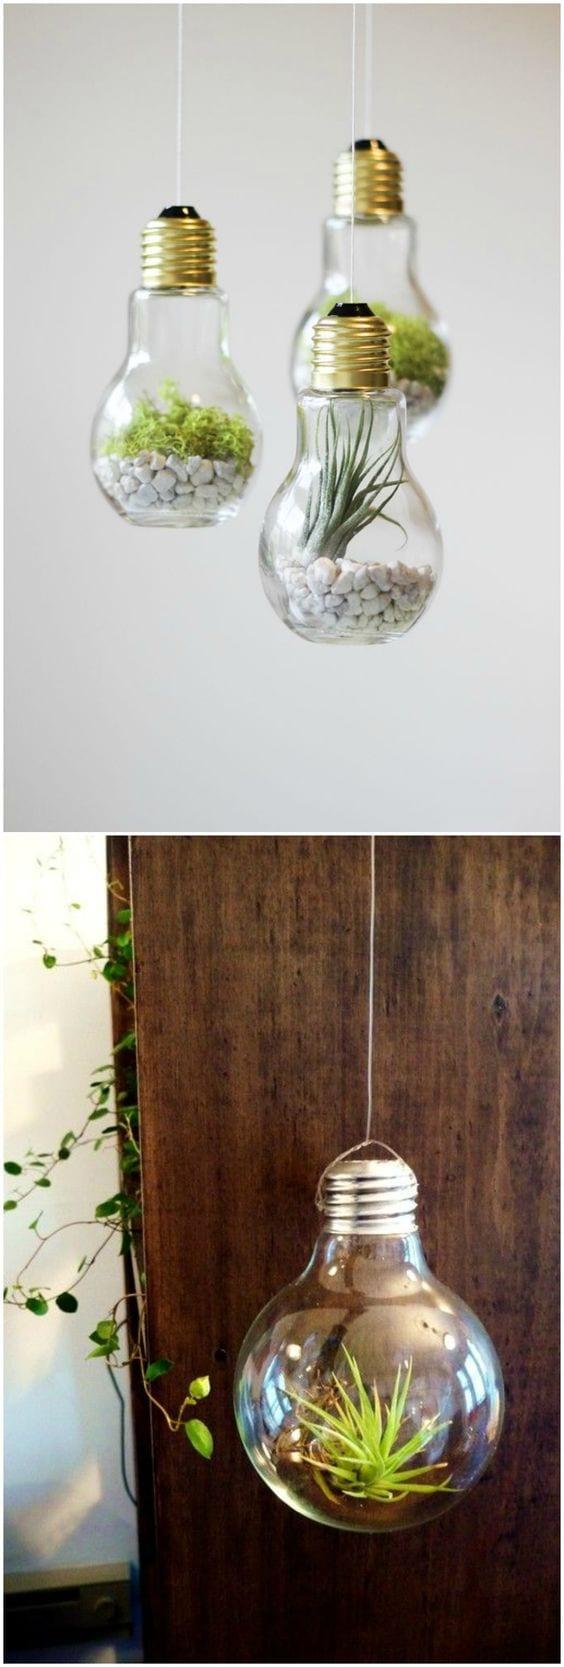 Etiket: ampulden vazo